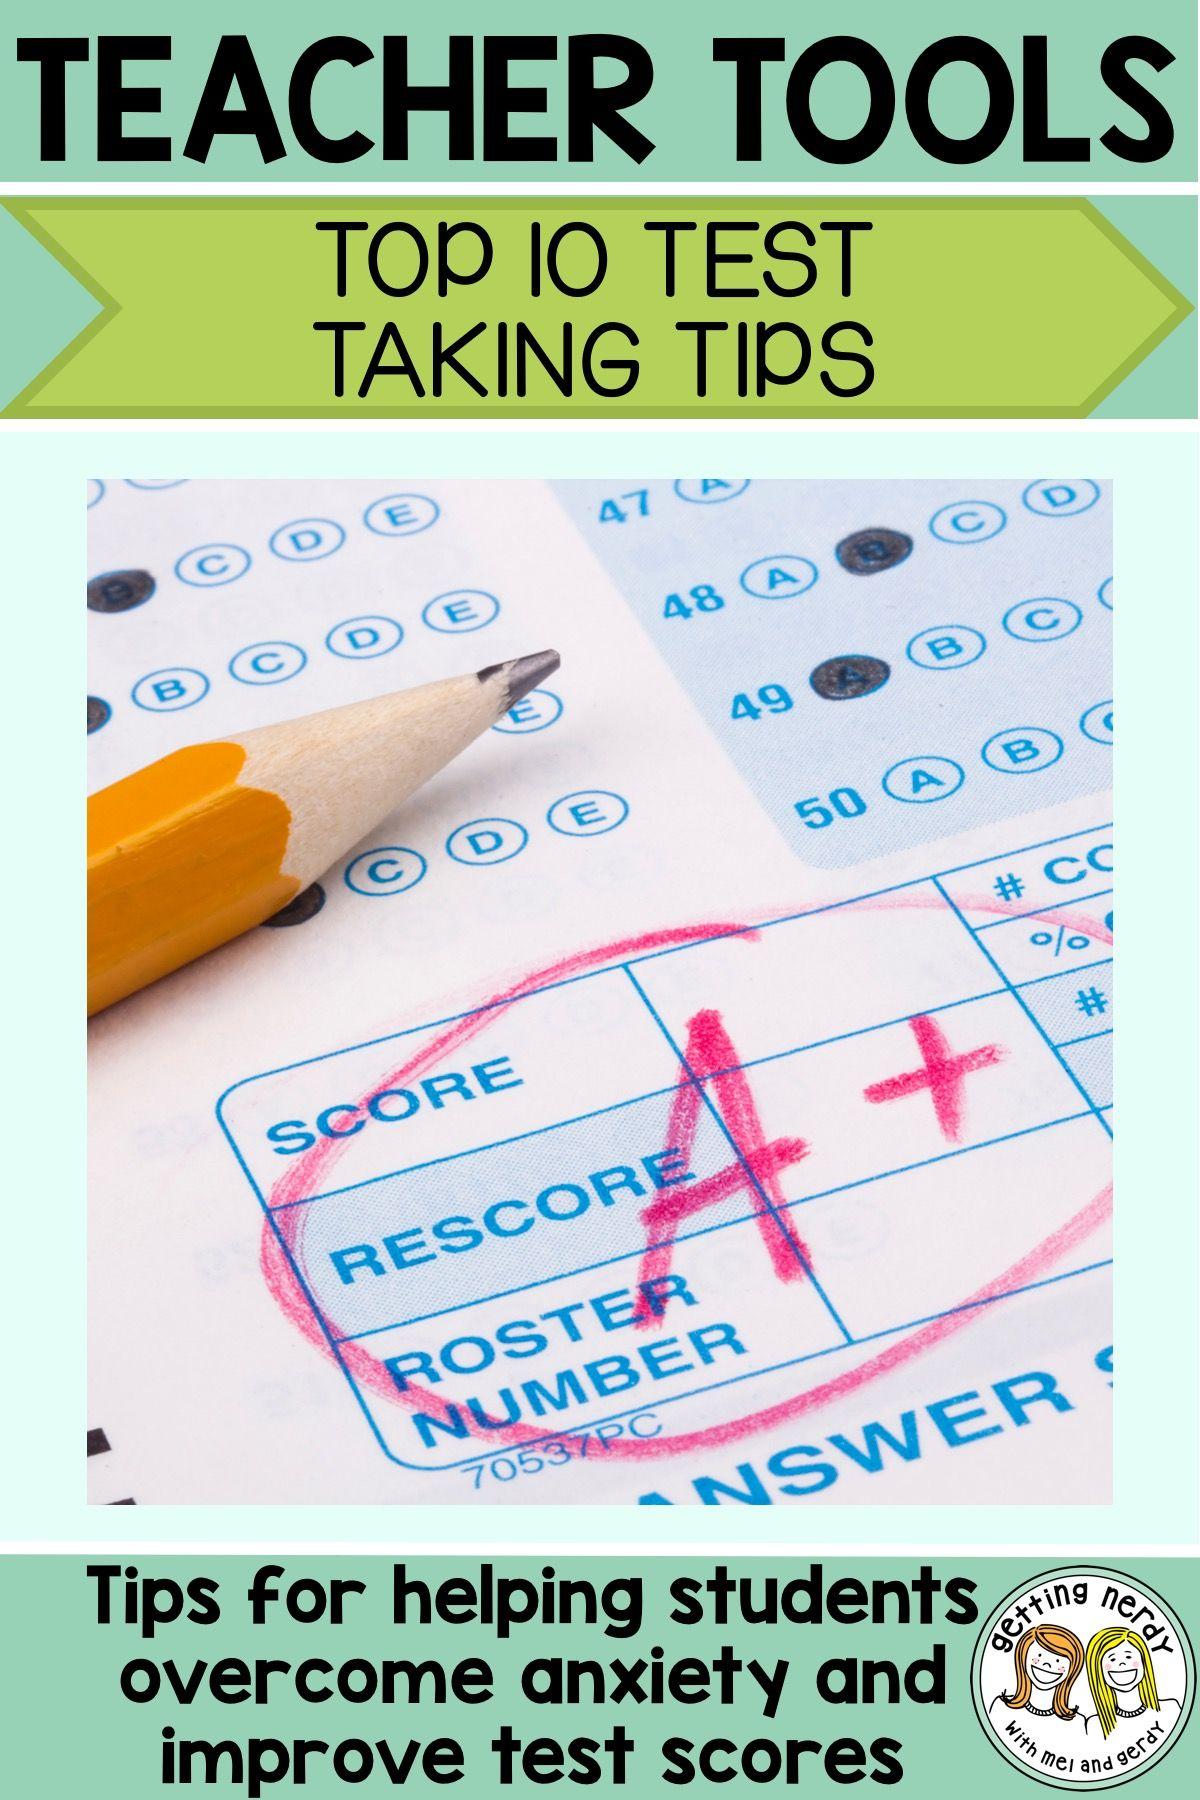 Teacher Tools Top Ten Test Taking Strategies